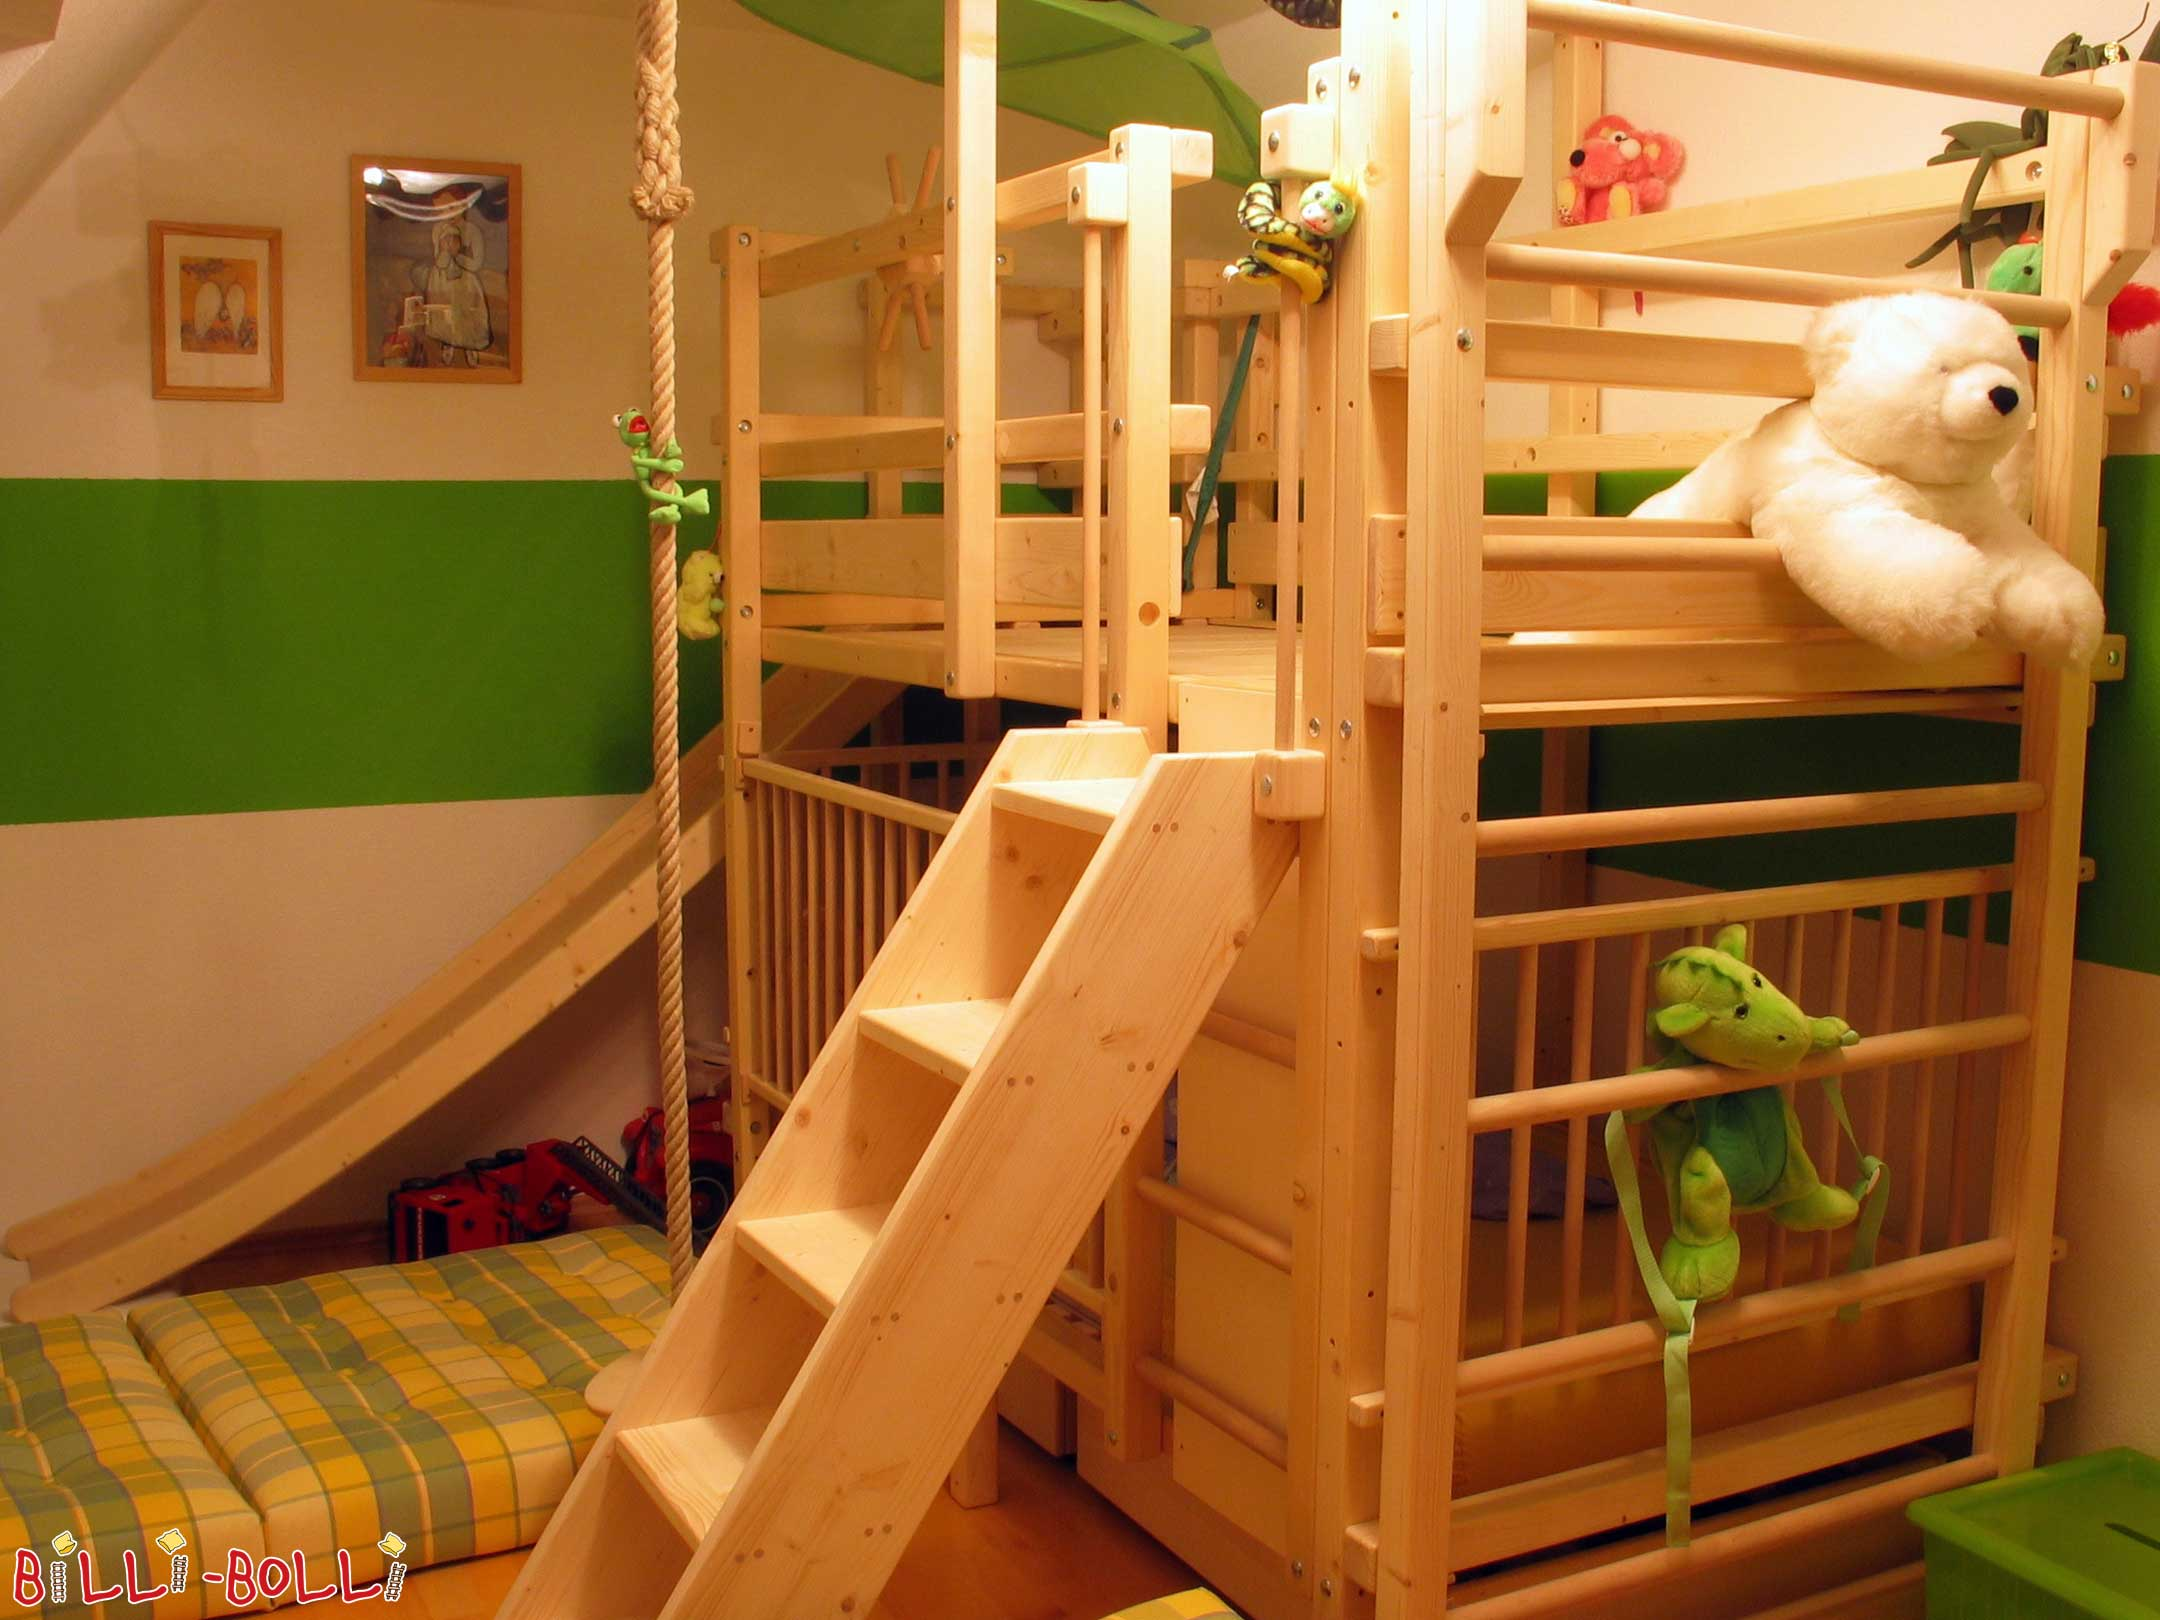 etagenbett billi bolli kinderm bel. Black Bedroom Furniture Sets. Home Design Ideas